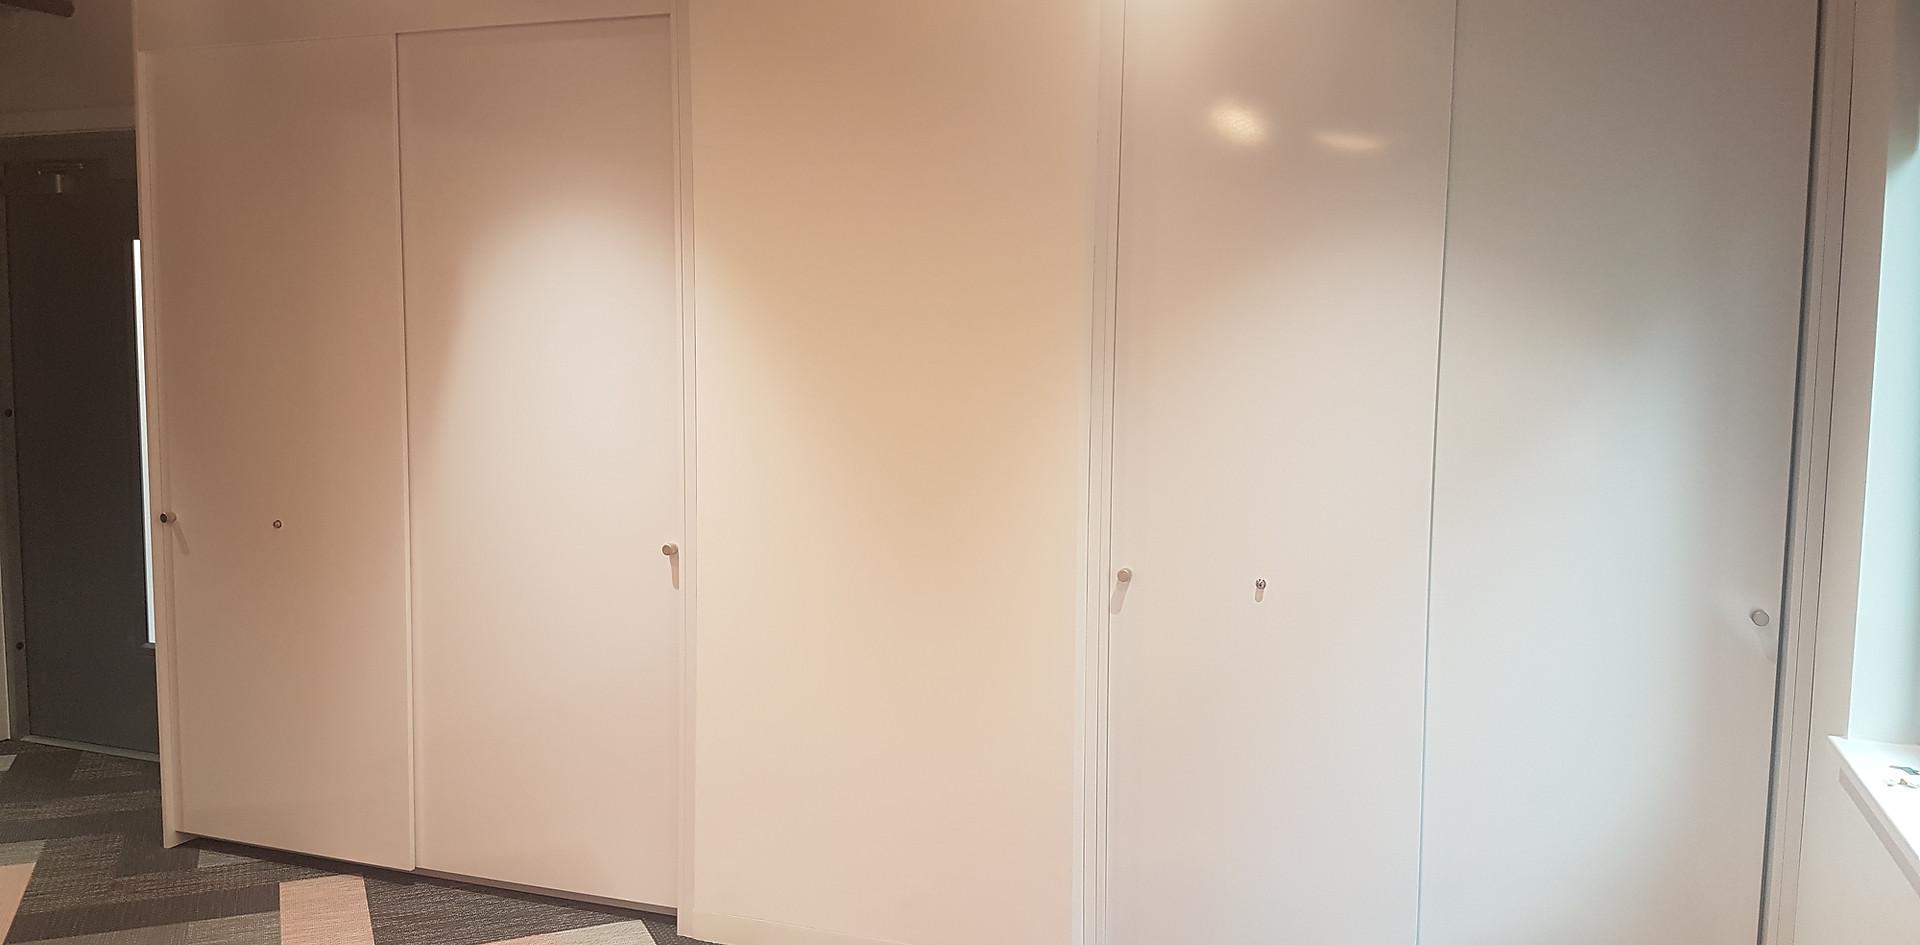 office storagewall tallwall sliding doors